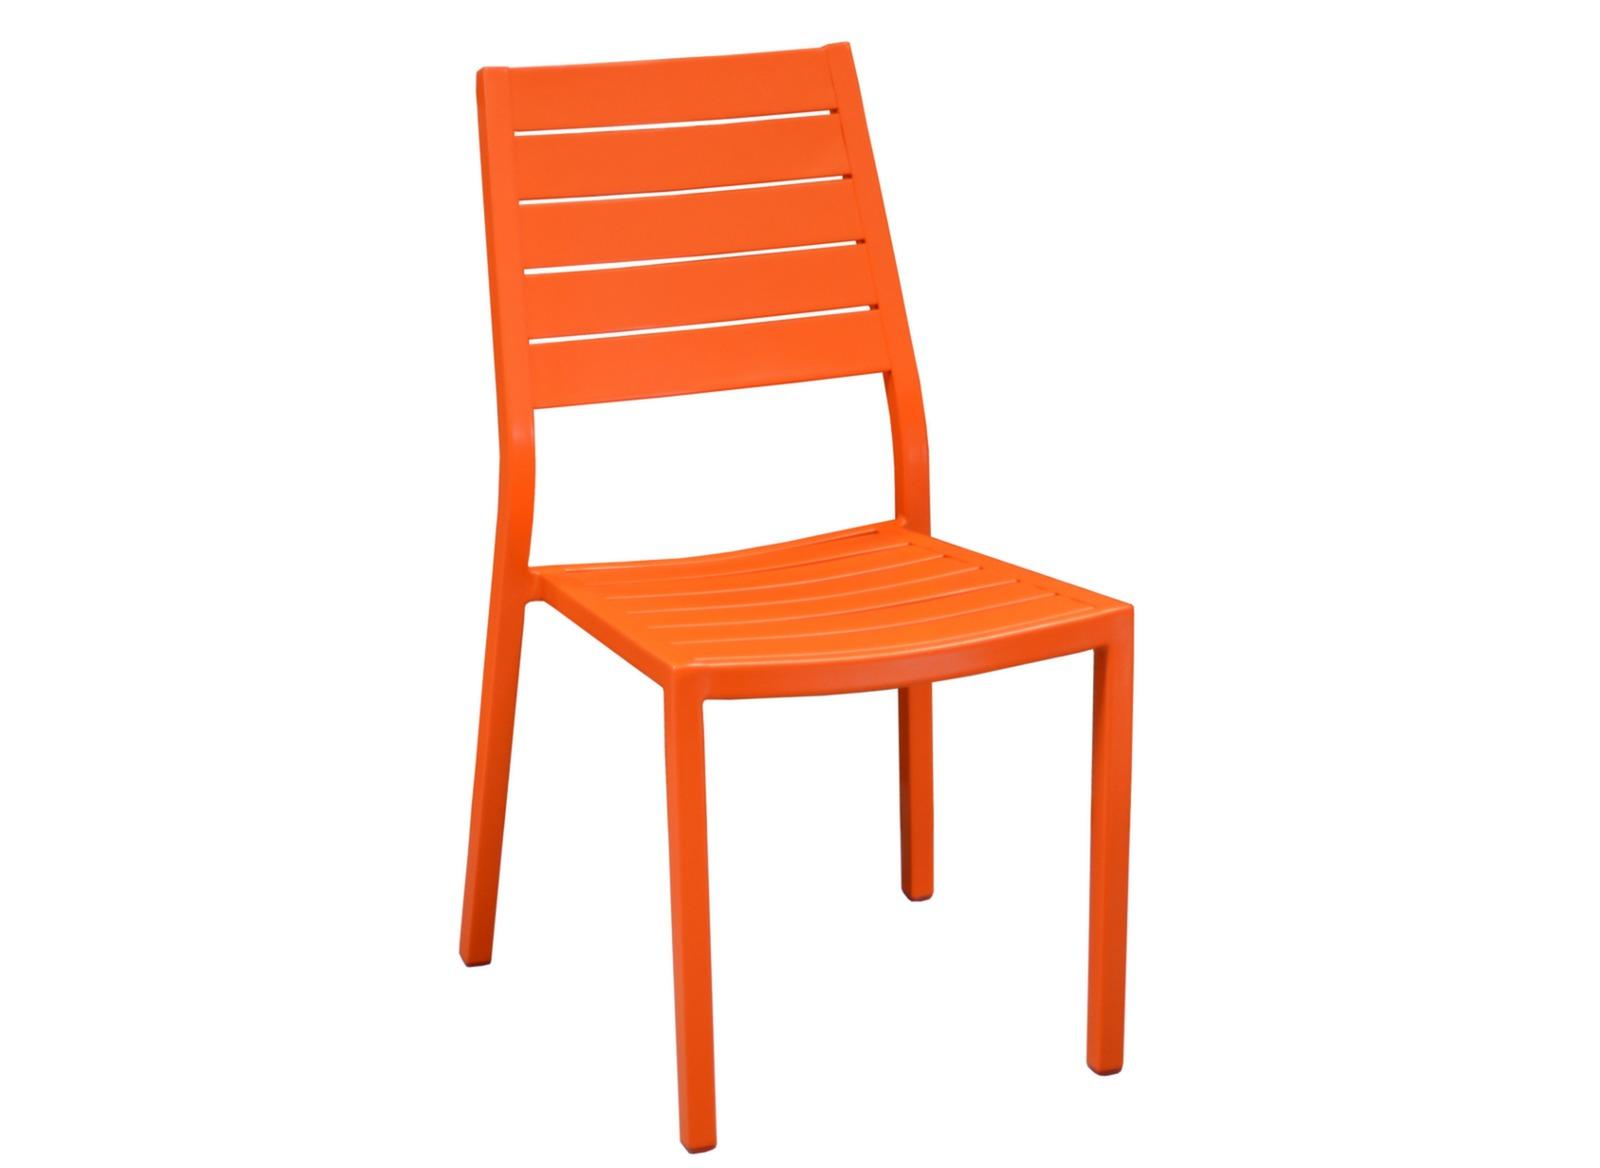 Chaise aluminium orange salon de jardin latin oc o - Chaises aluminium de jardin ...